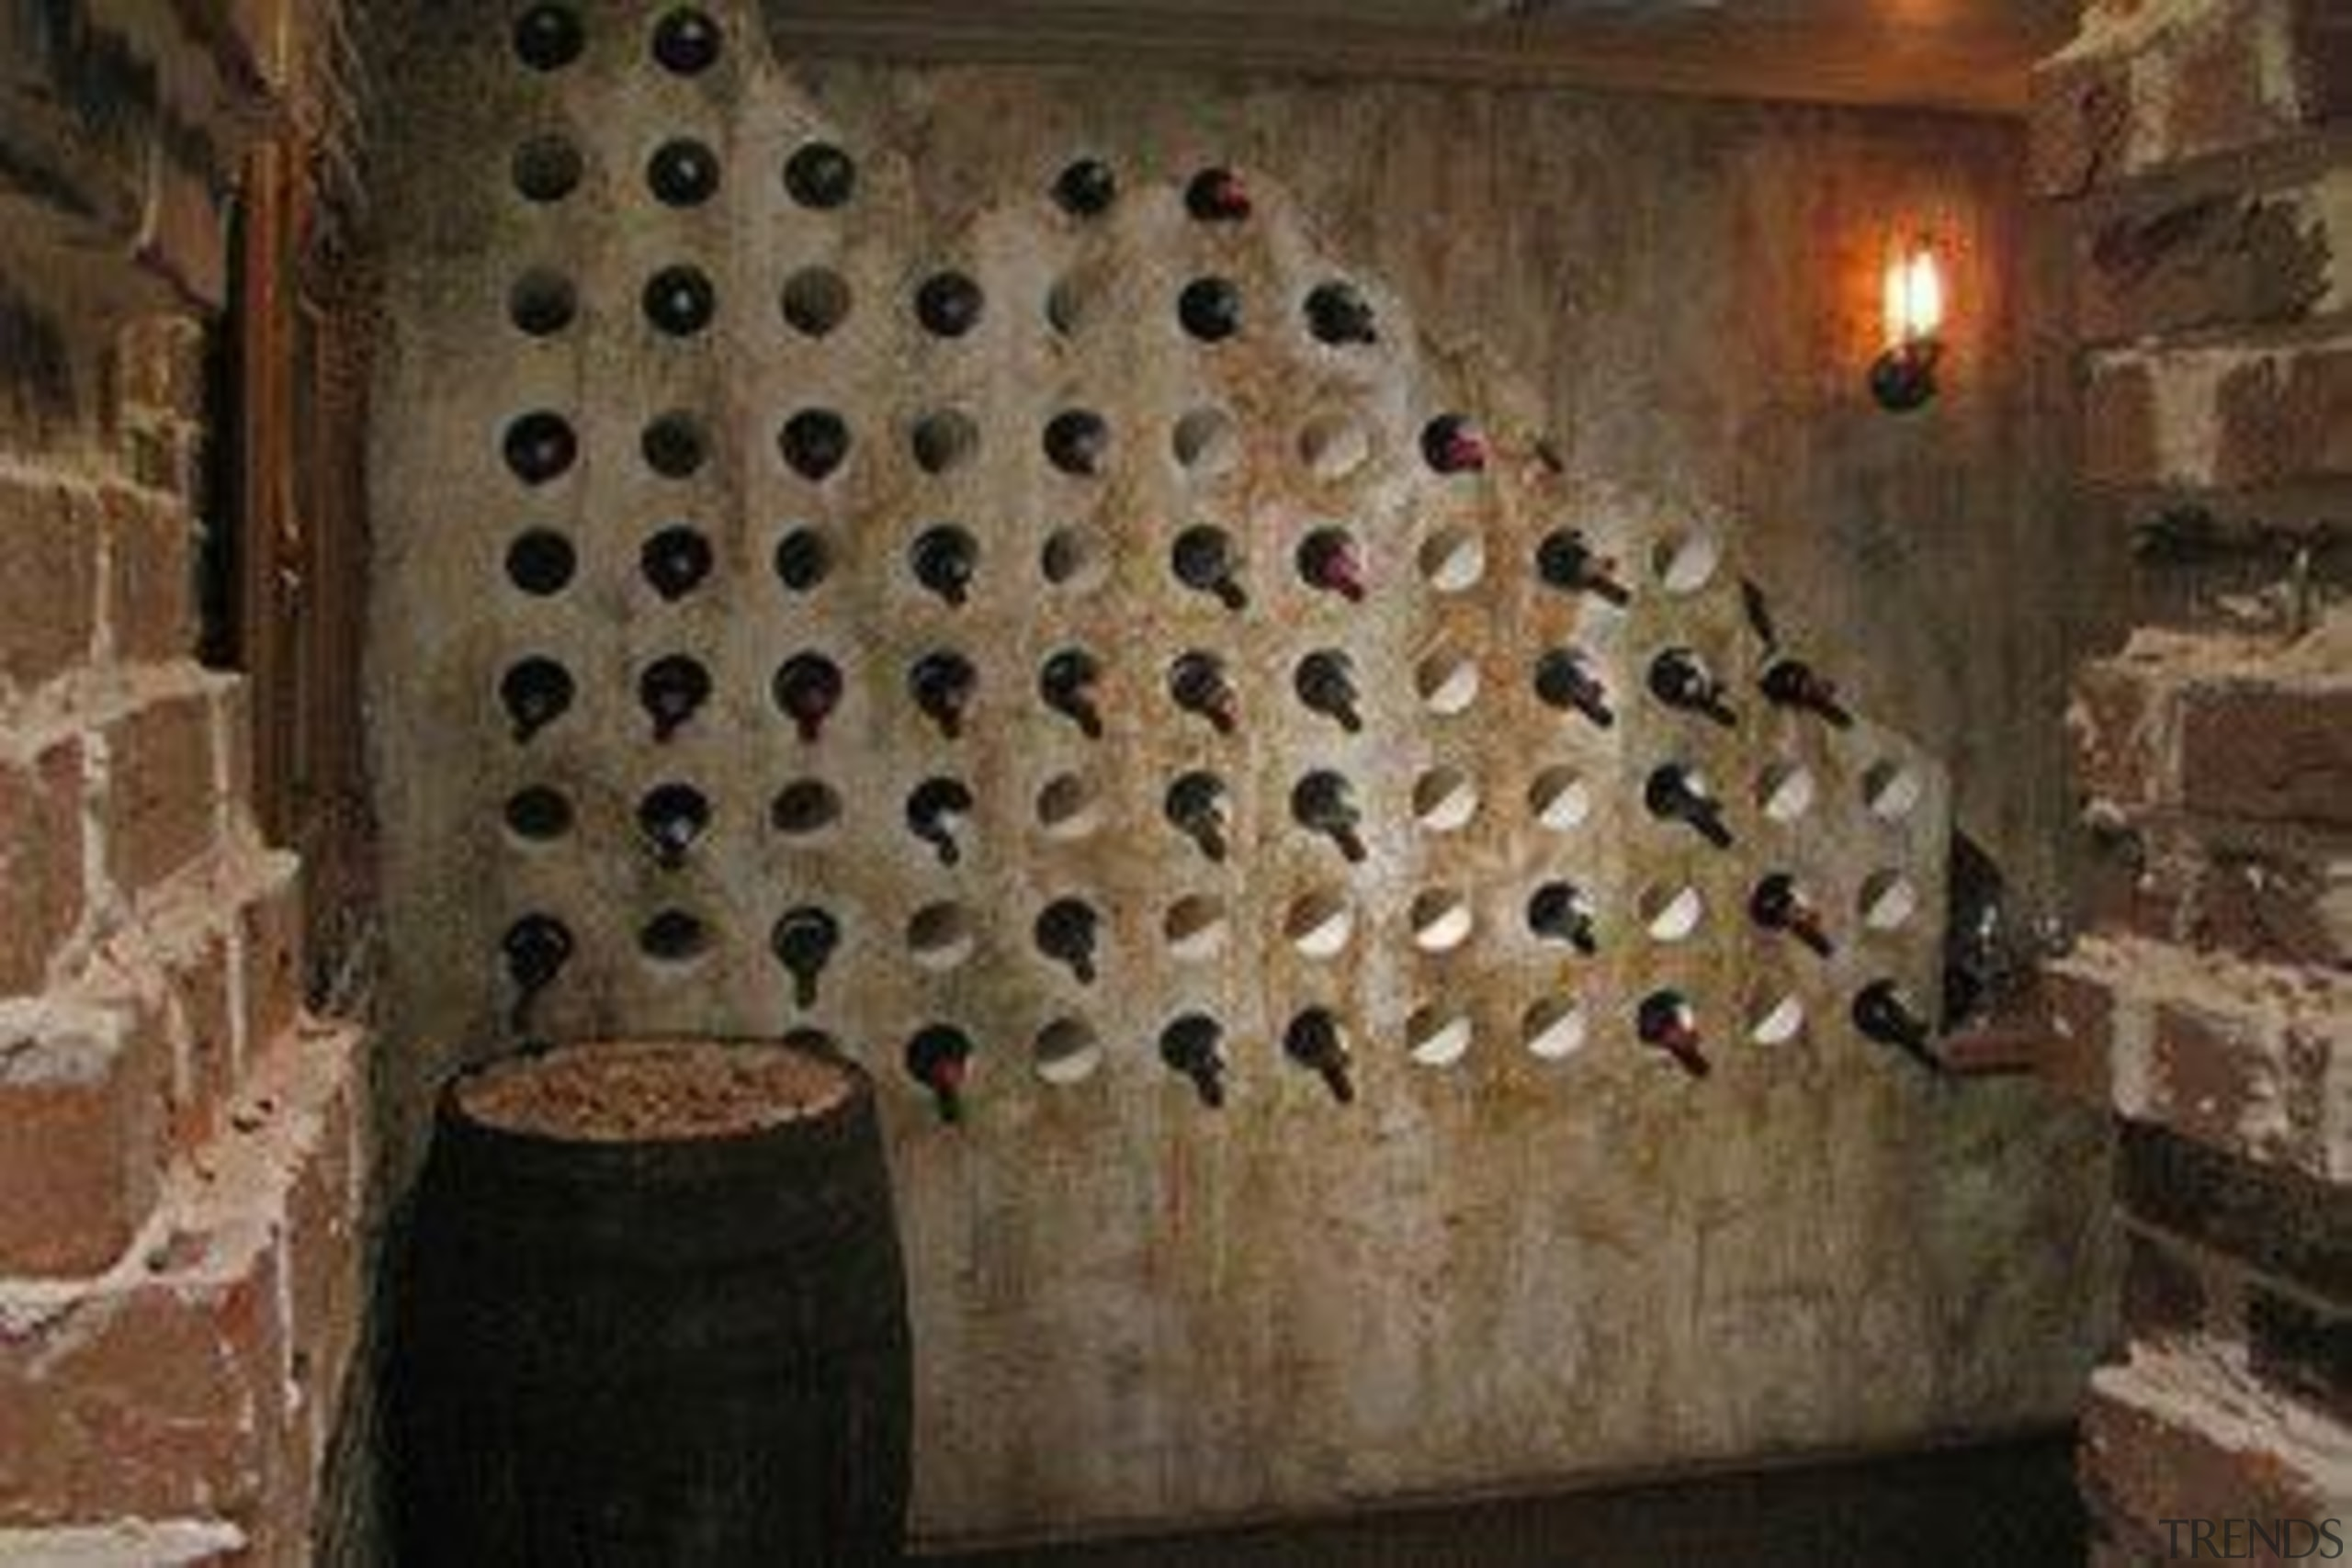 Modern Wine Cellar Ideas - Modern Wine Cellar wall, wine cellar, winery, brown, black